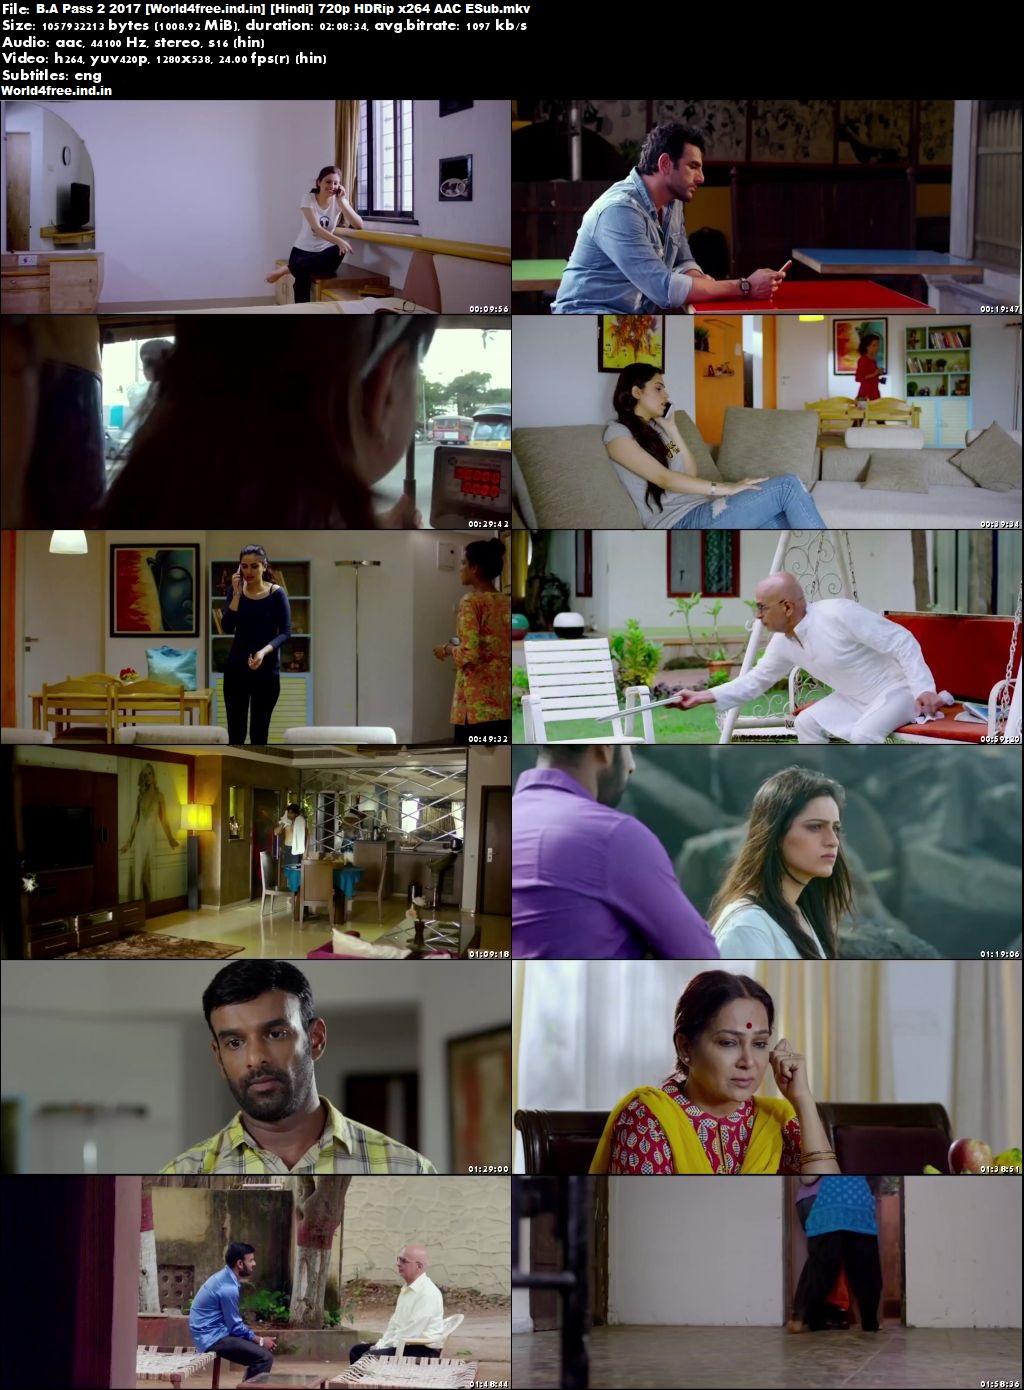 world4free B.A Pass 2 2017 Full HDRip 720p Hindi Movie Download